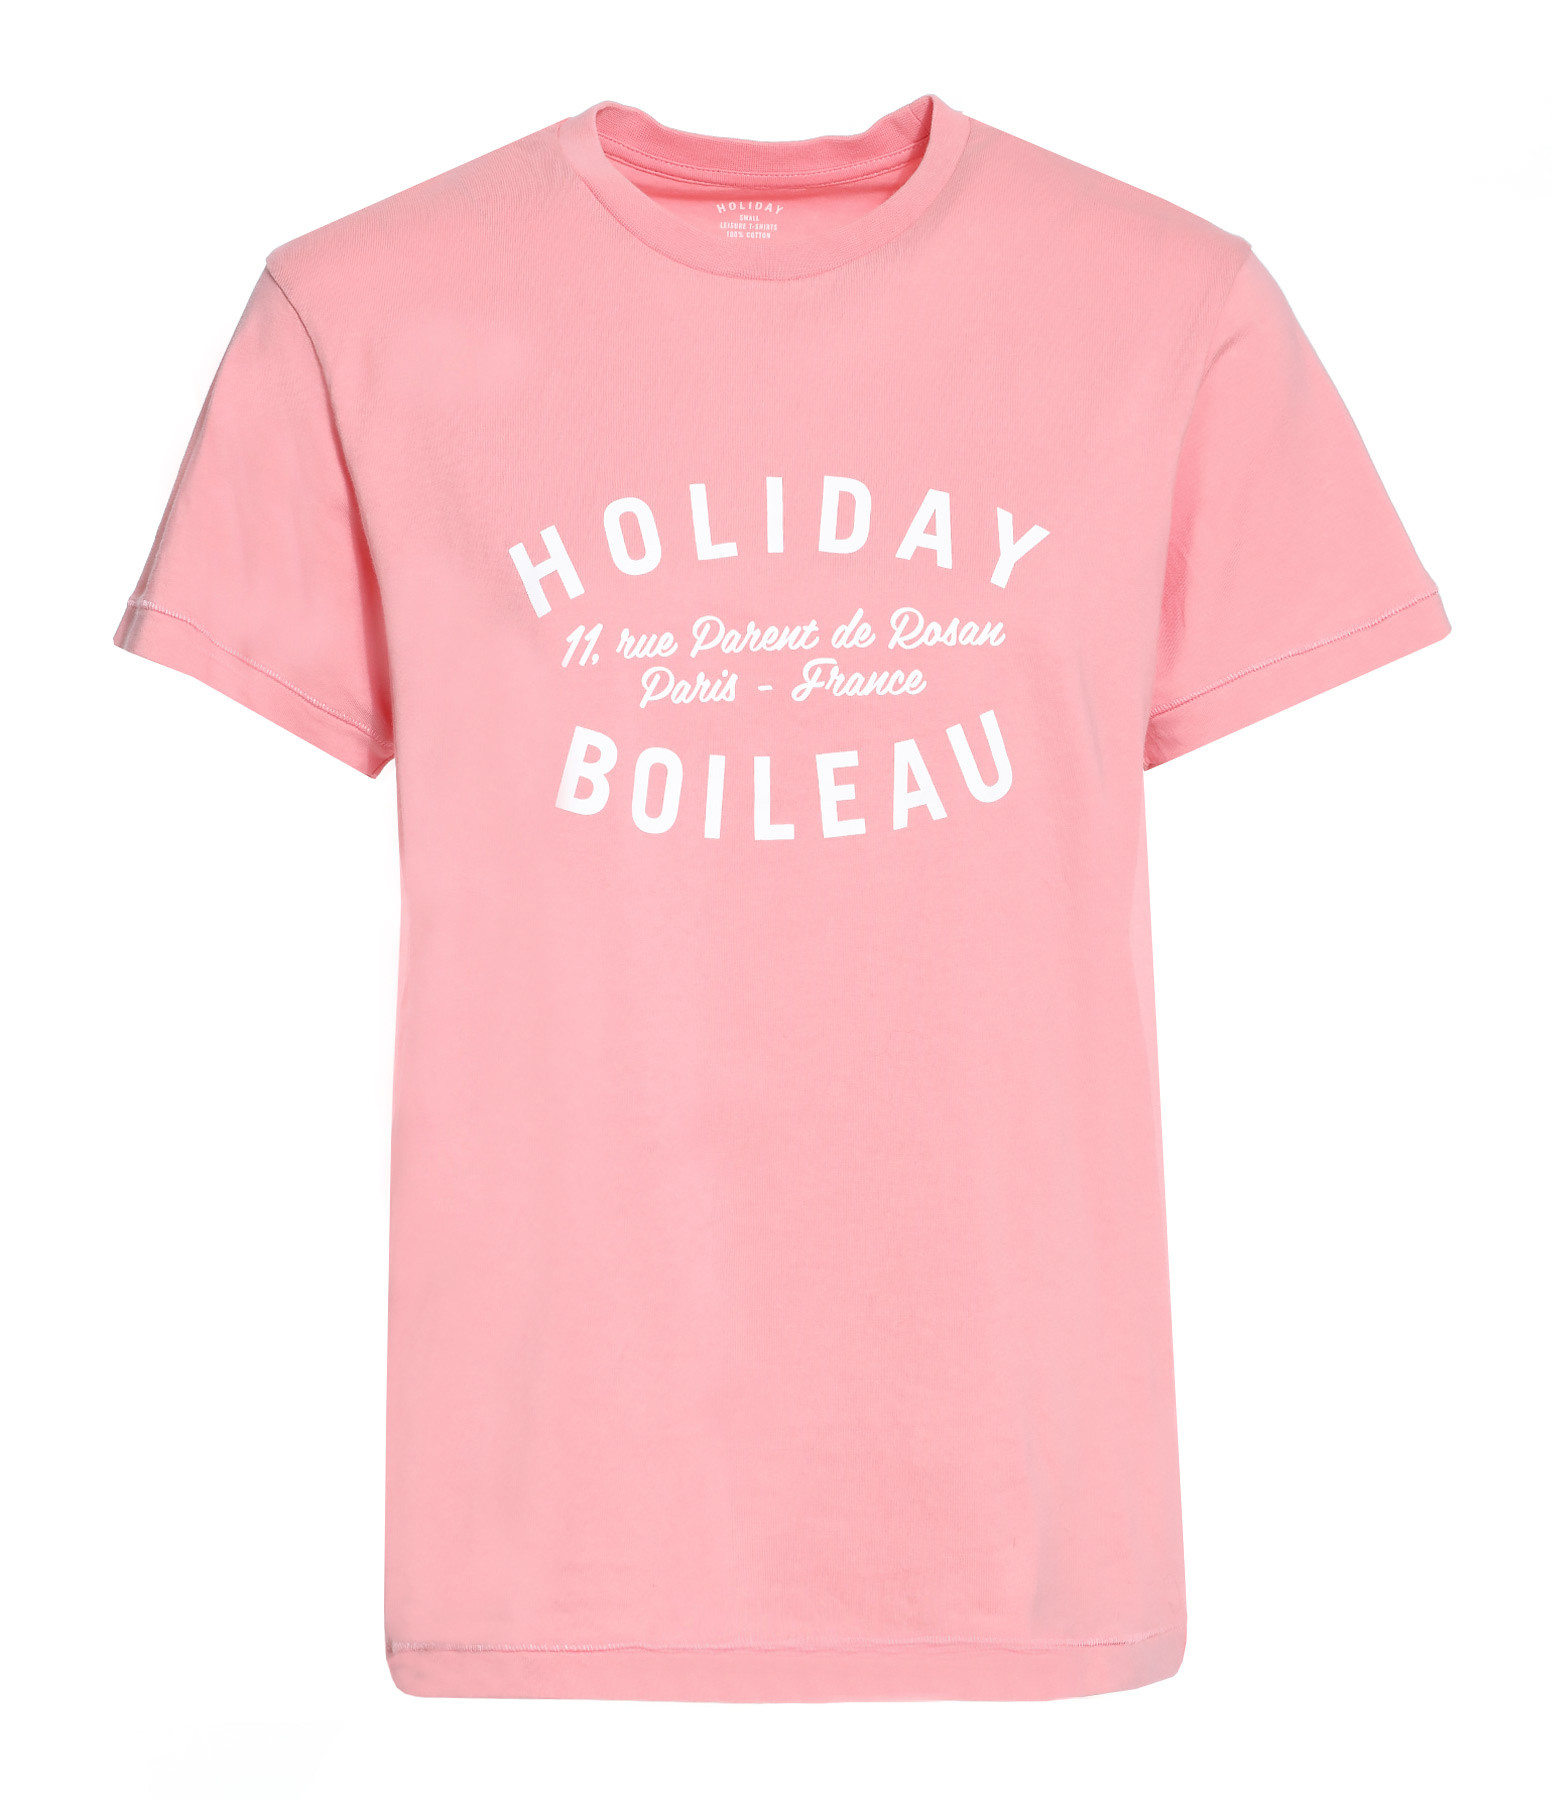 HOLIDAY - Tee-shirt Boileau Coton Rose